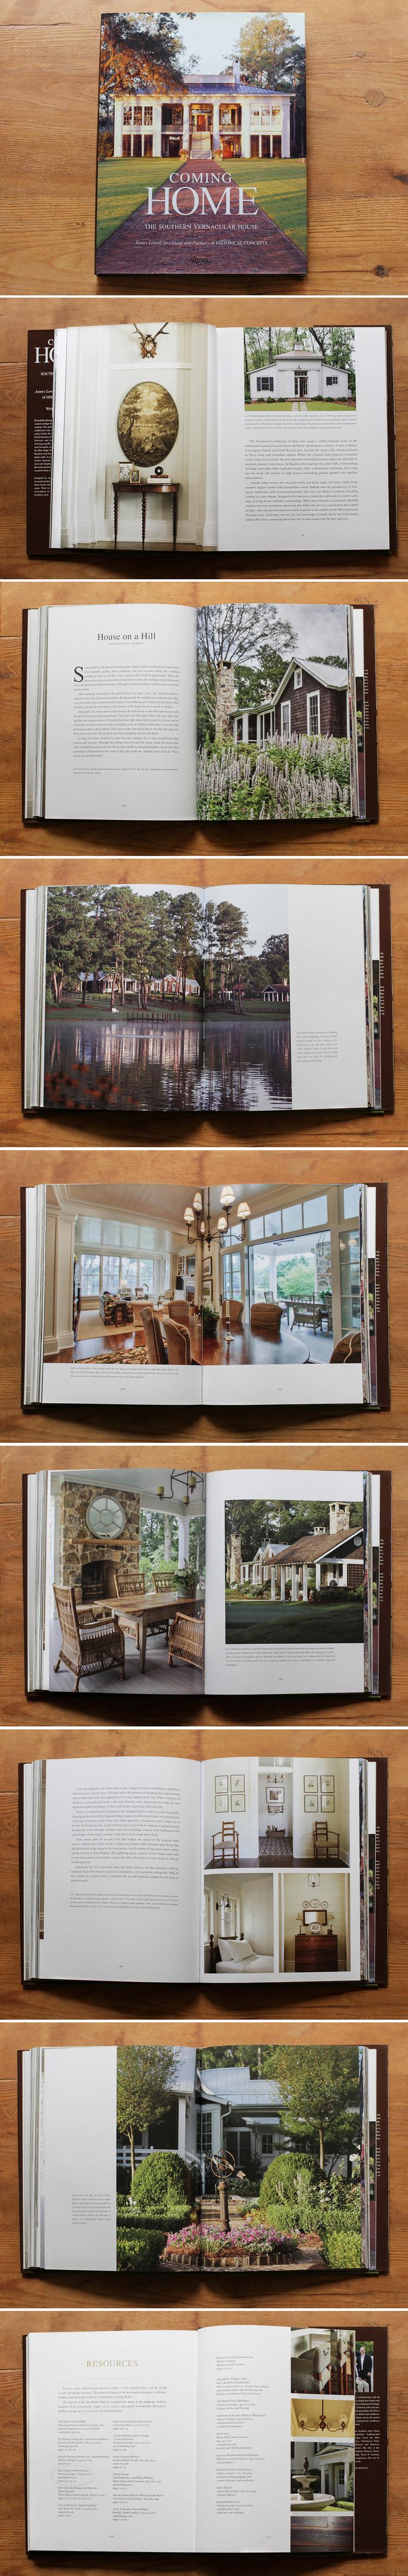 melanie davis design interior design press melanie davis design bracey coming home all jpg